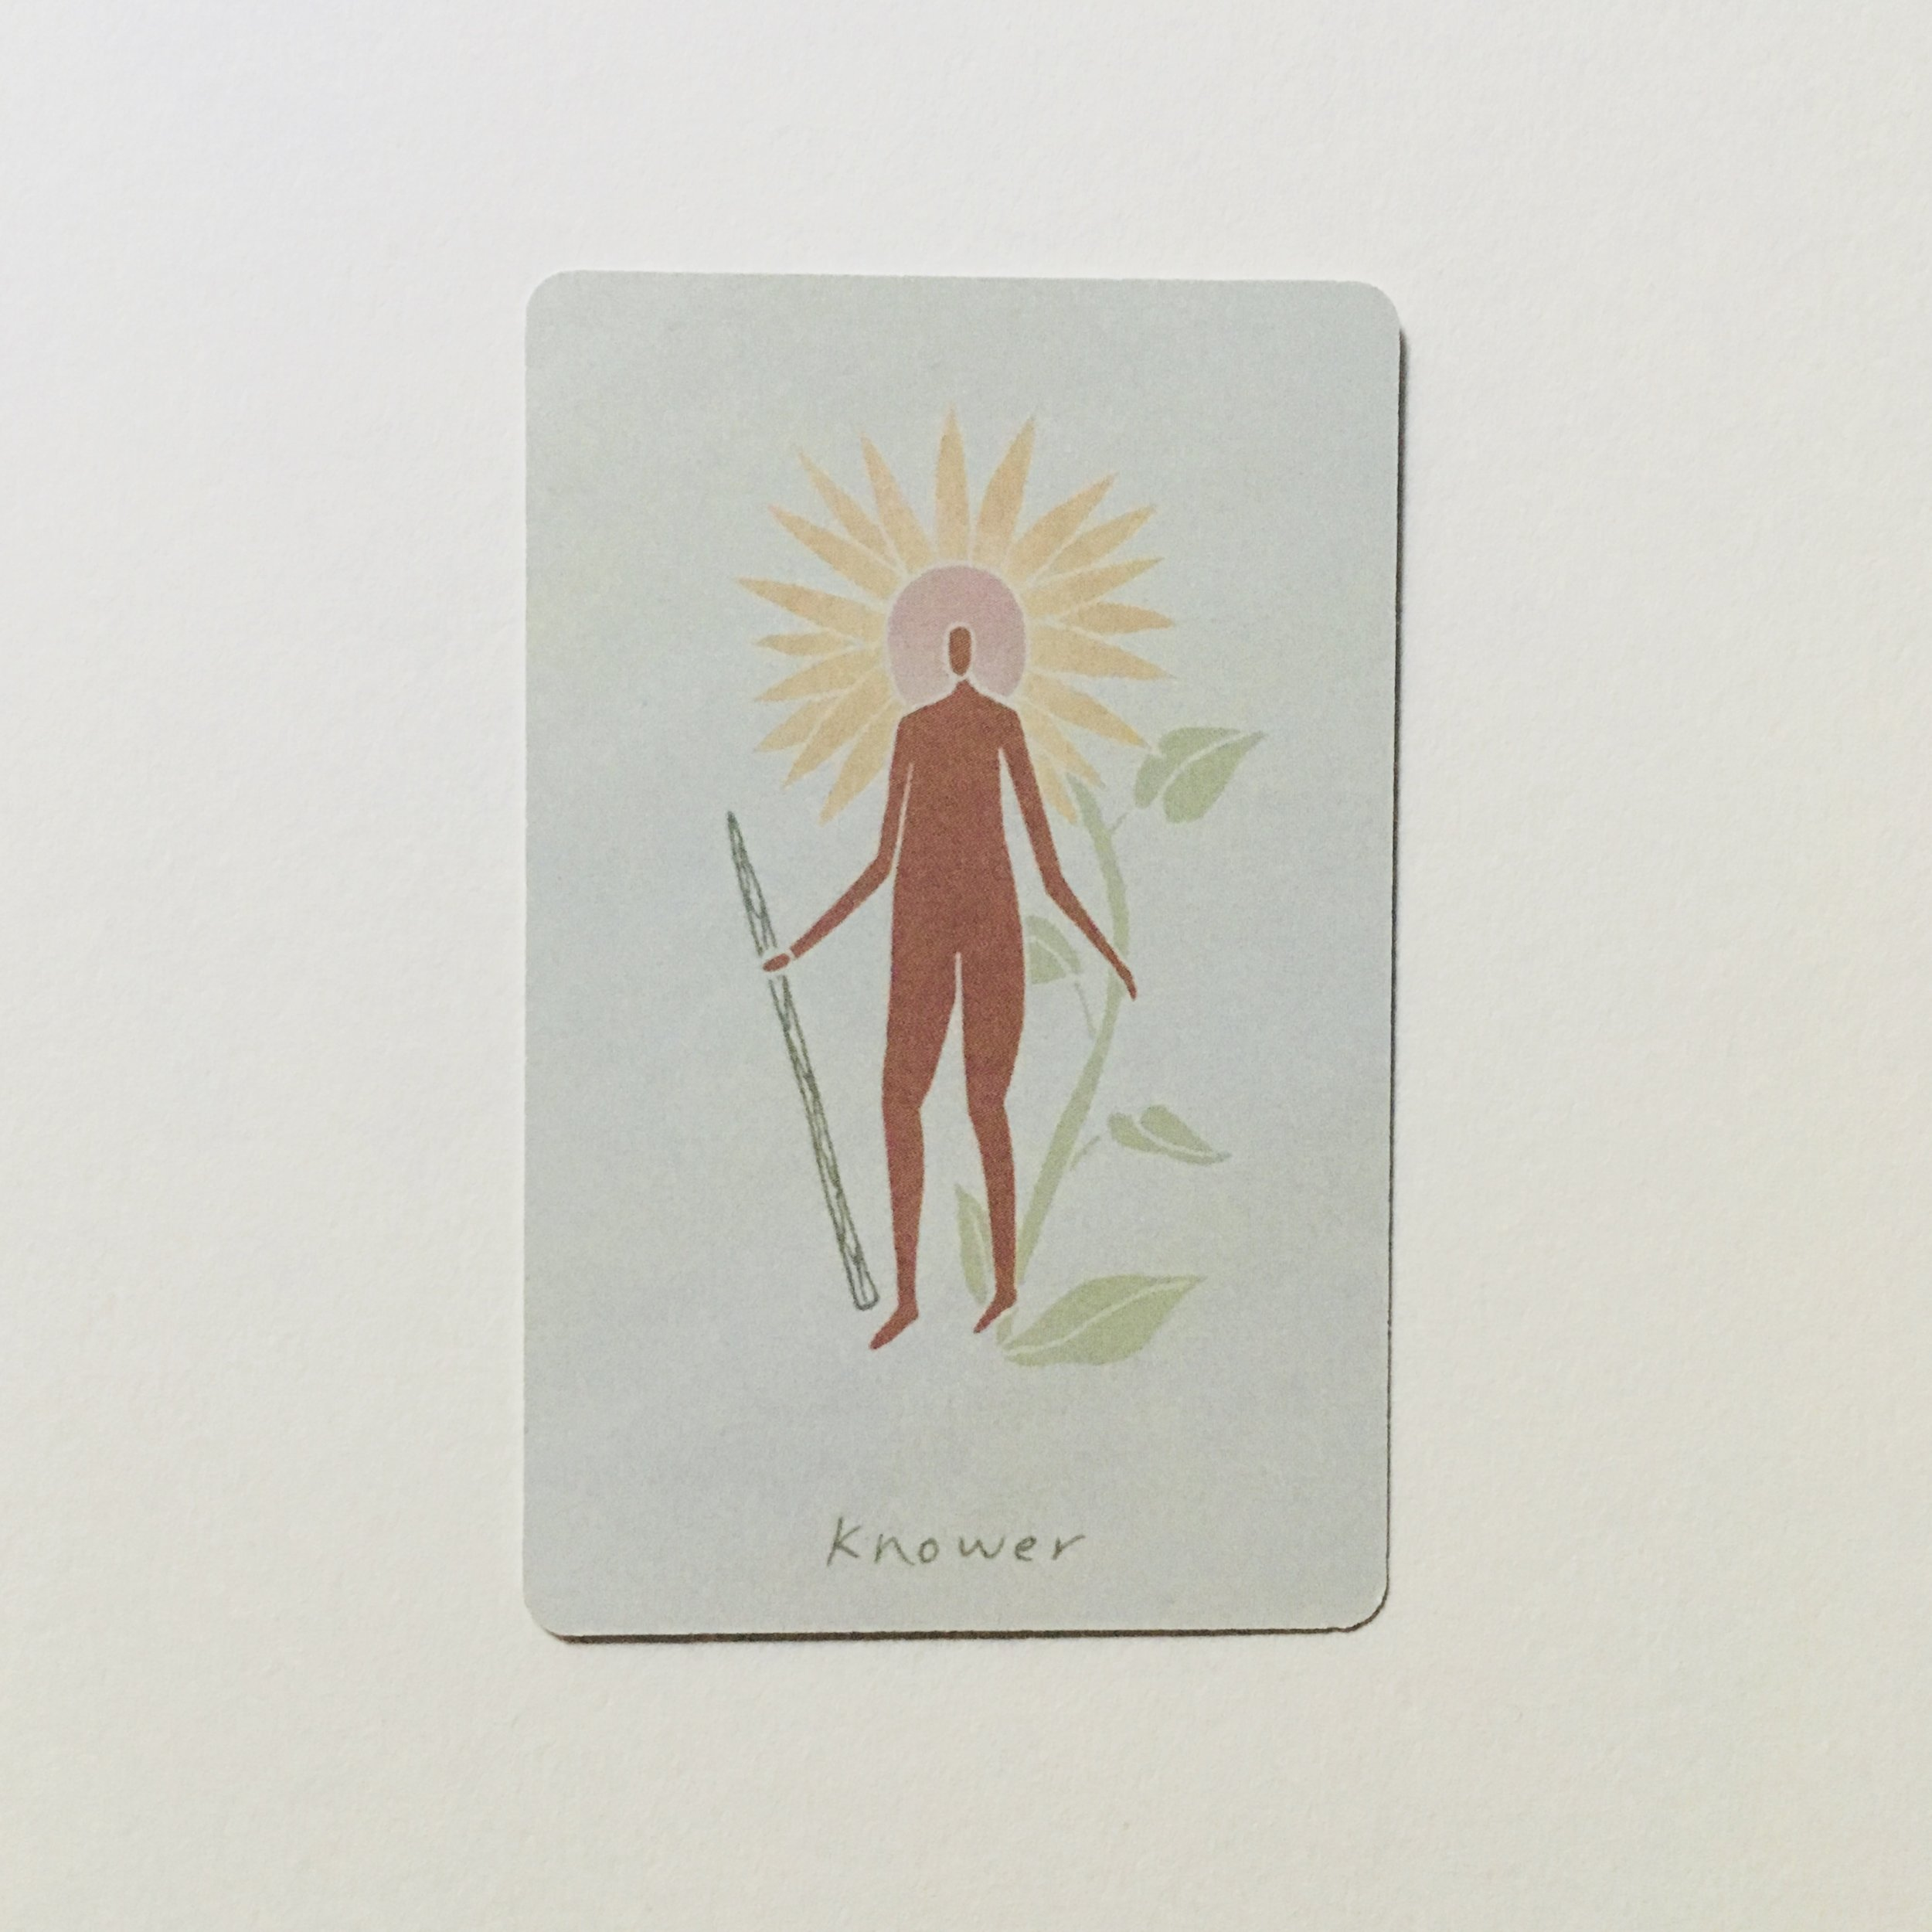 Knower of Wands, Mesquite Tarot